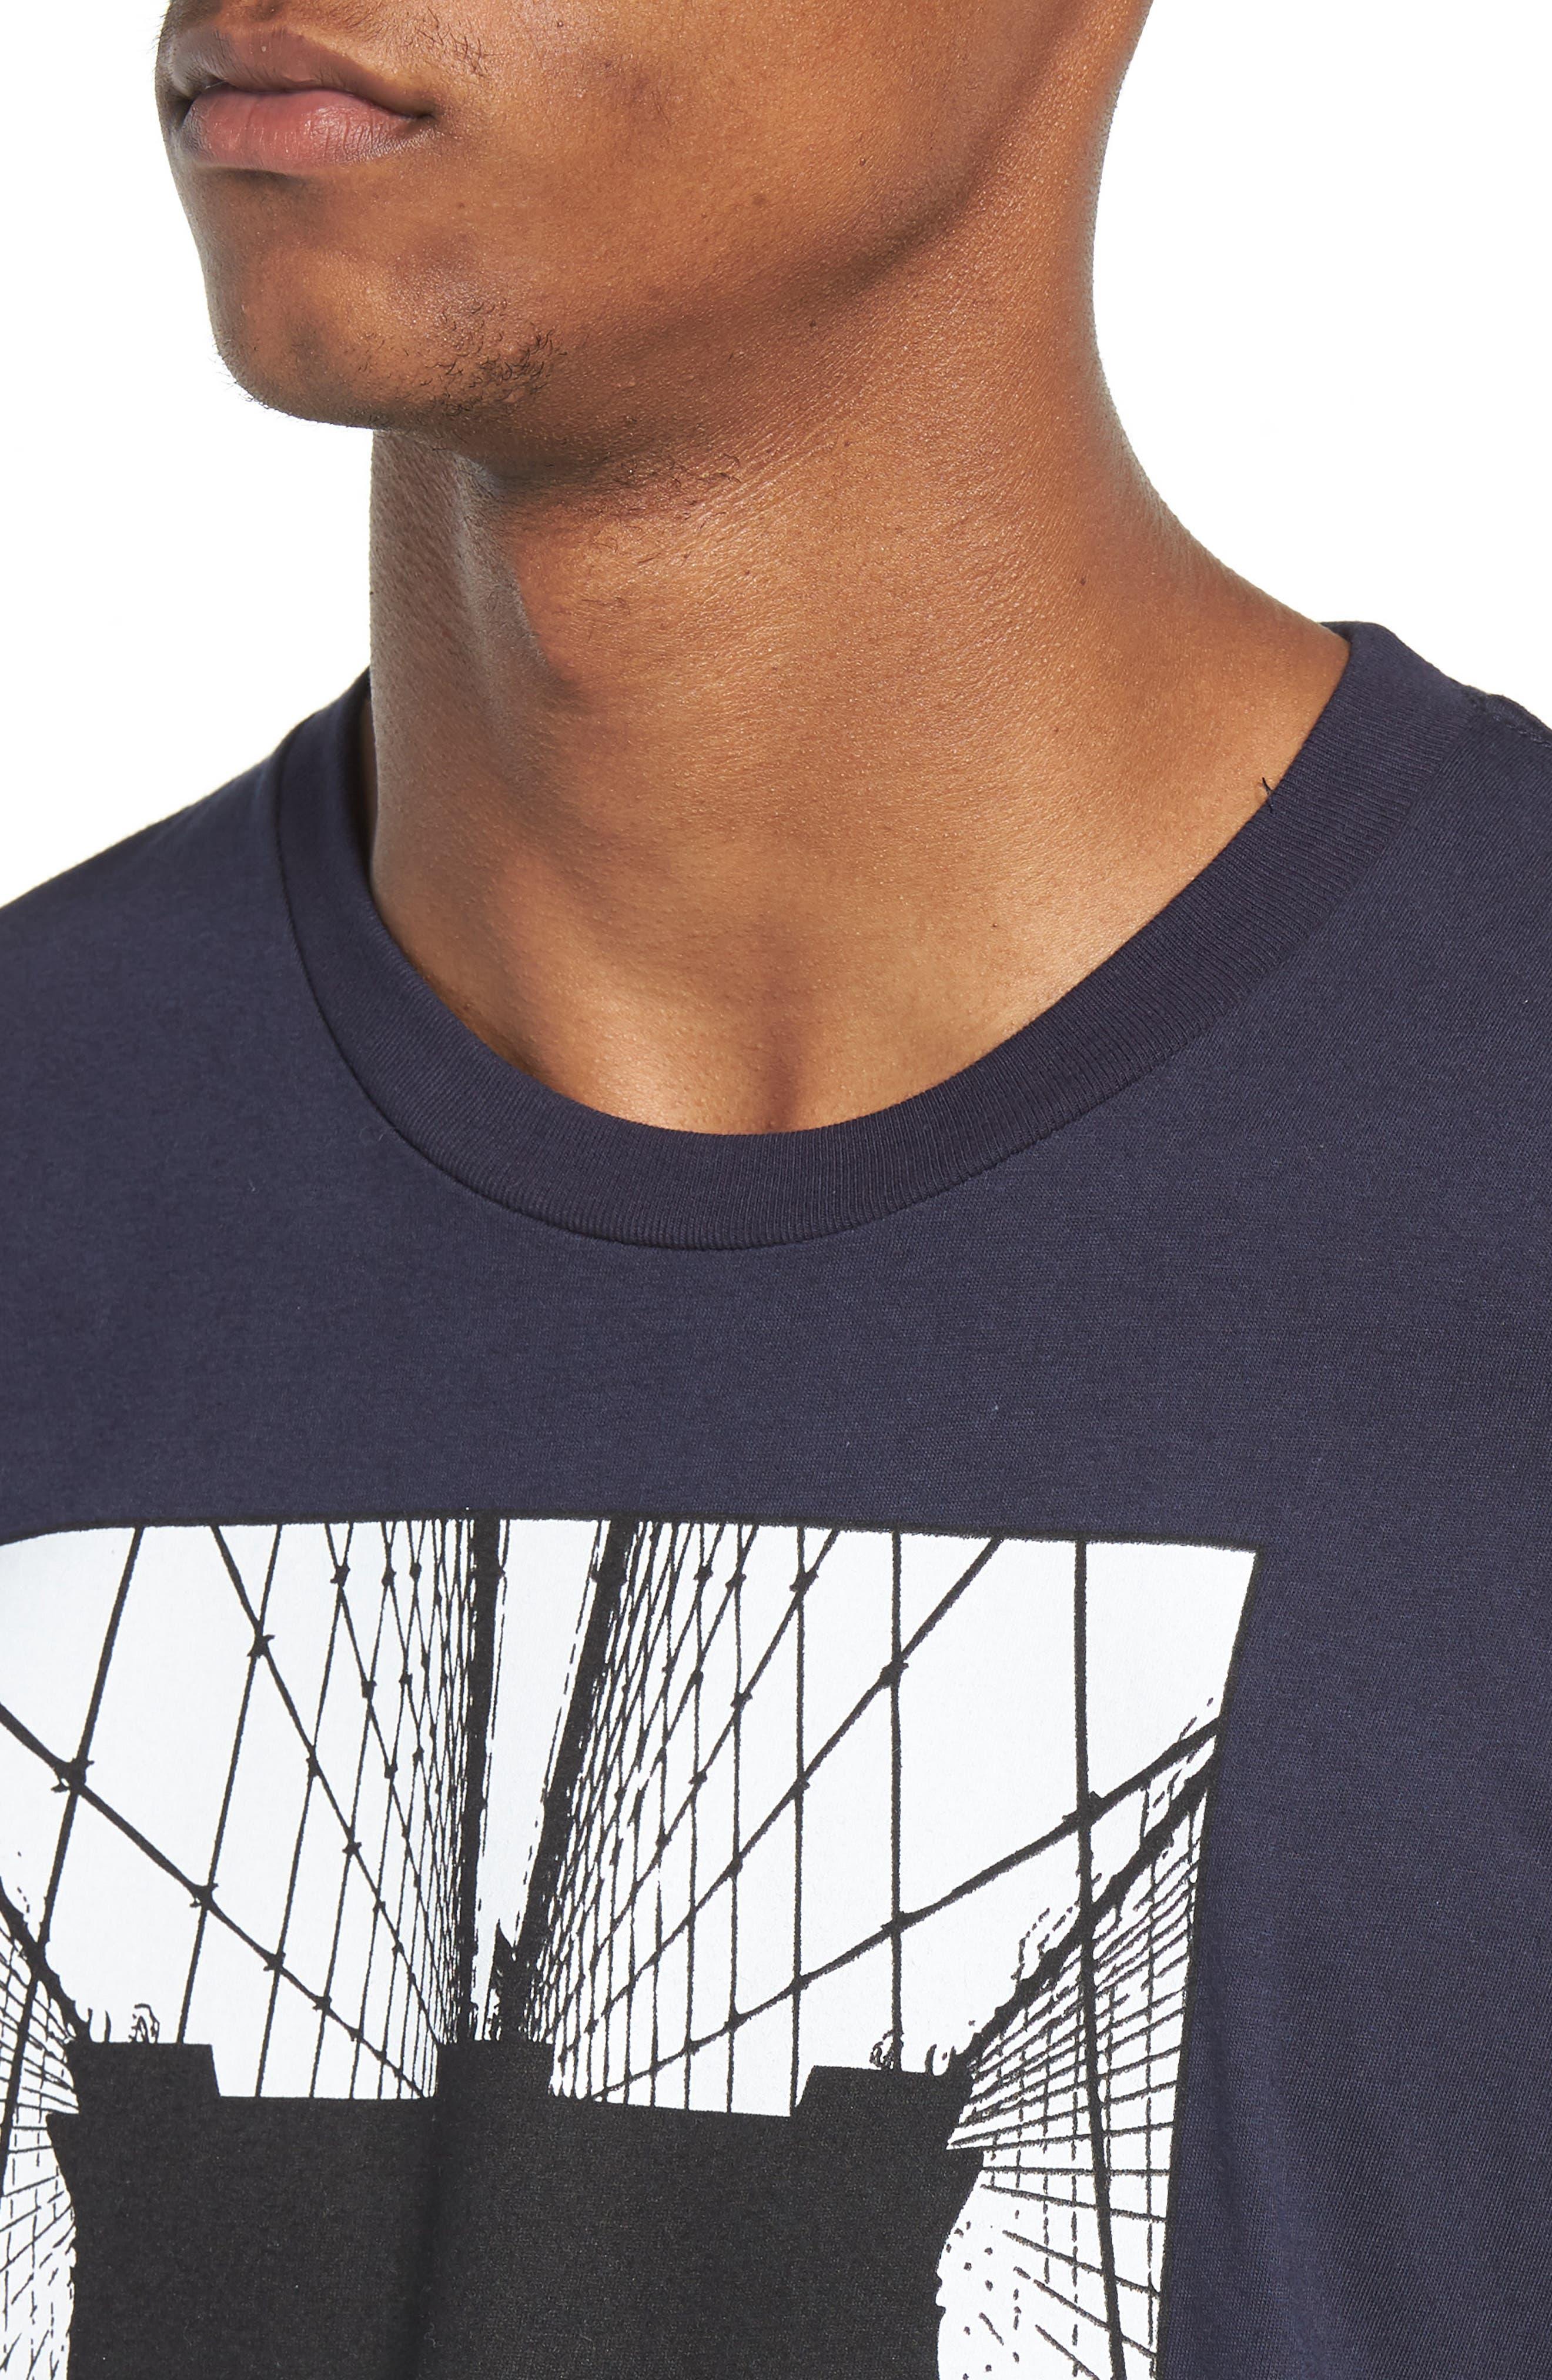 Brooklyn Bridge Graphic T-Shirt,                             Alternate thumbnail 4, color,                             Navy